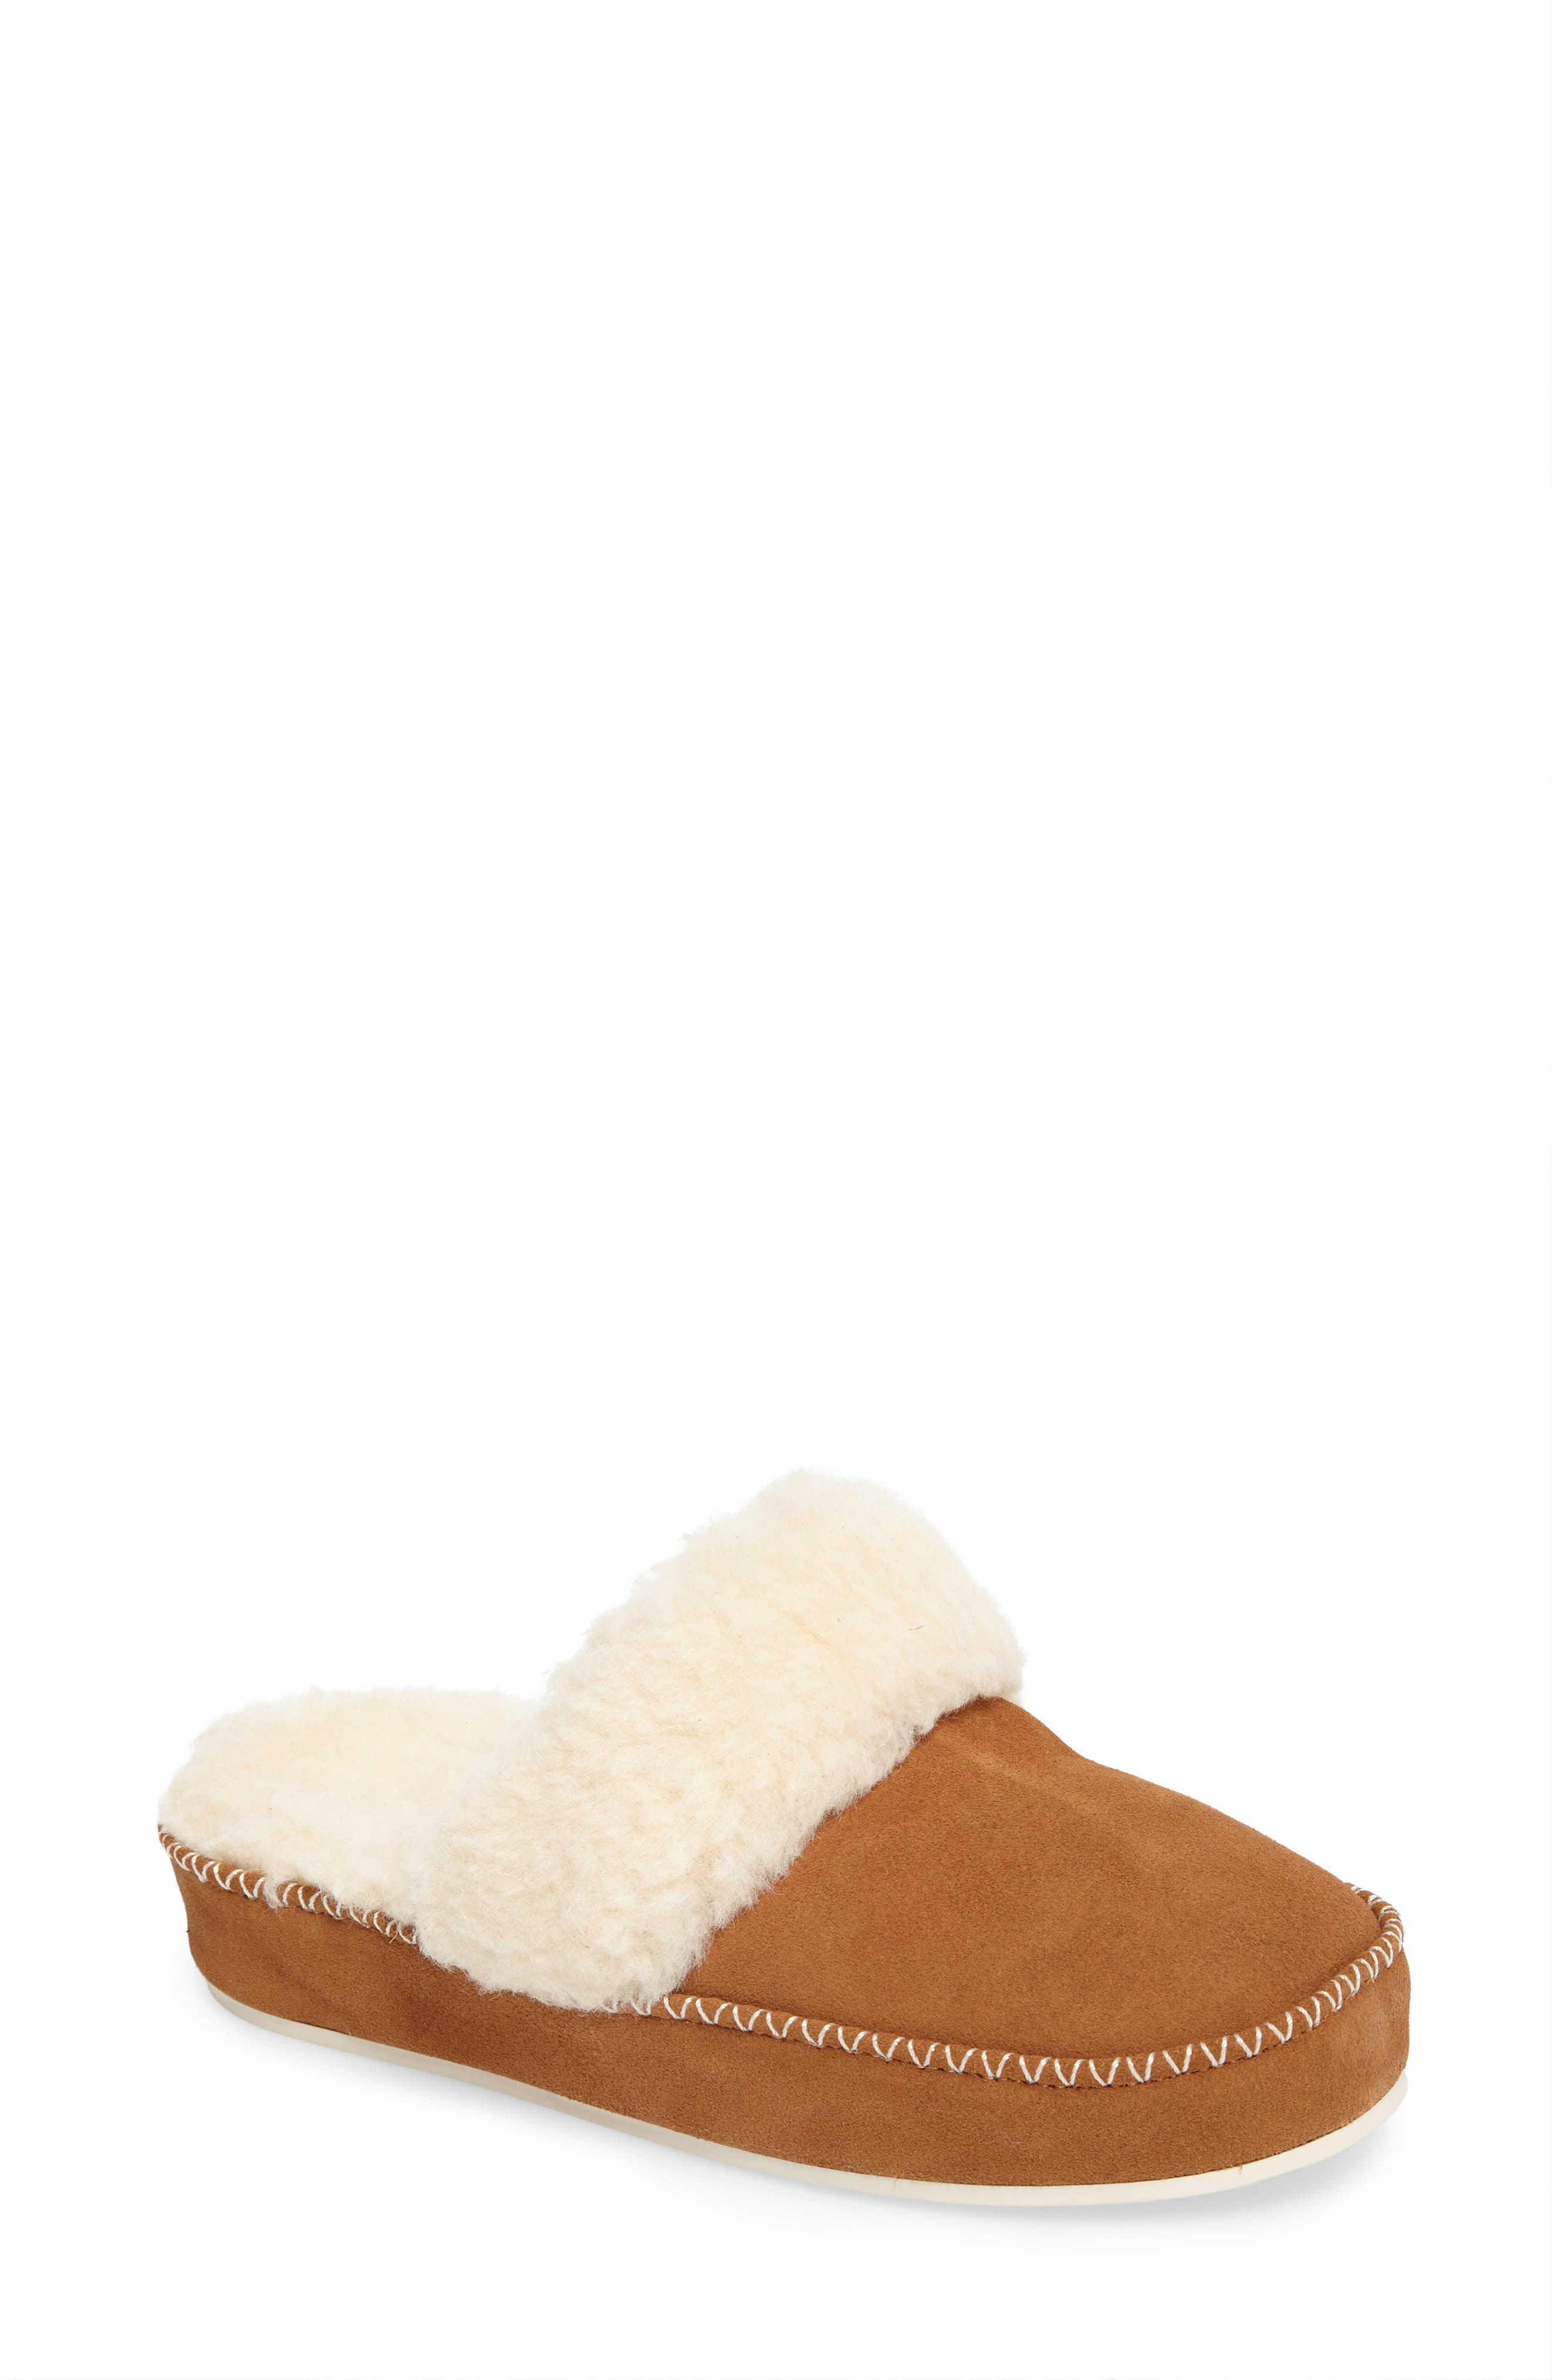 Marley Faux Fur Slipper,                         Main,                         color, Chestnut Suede